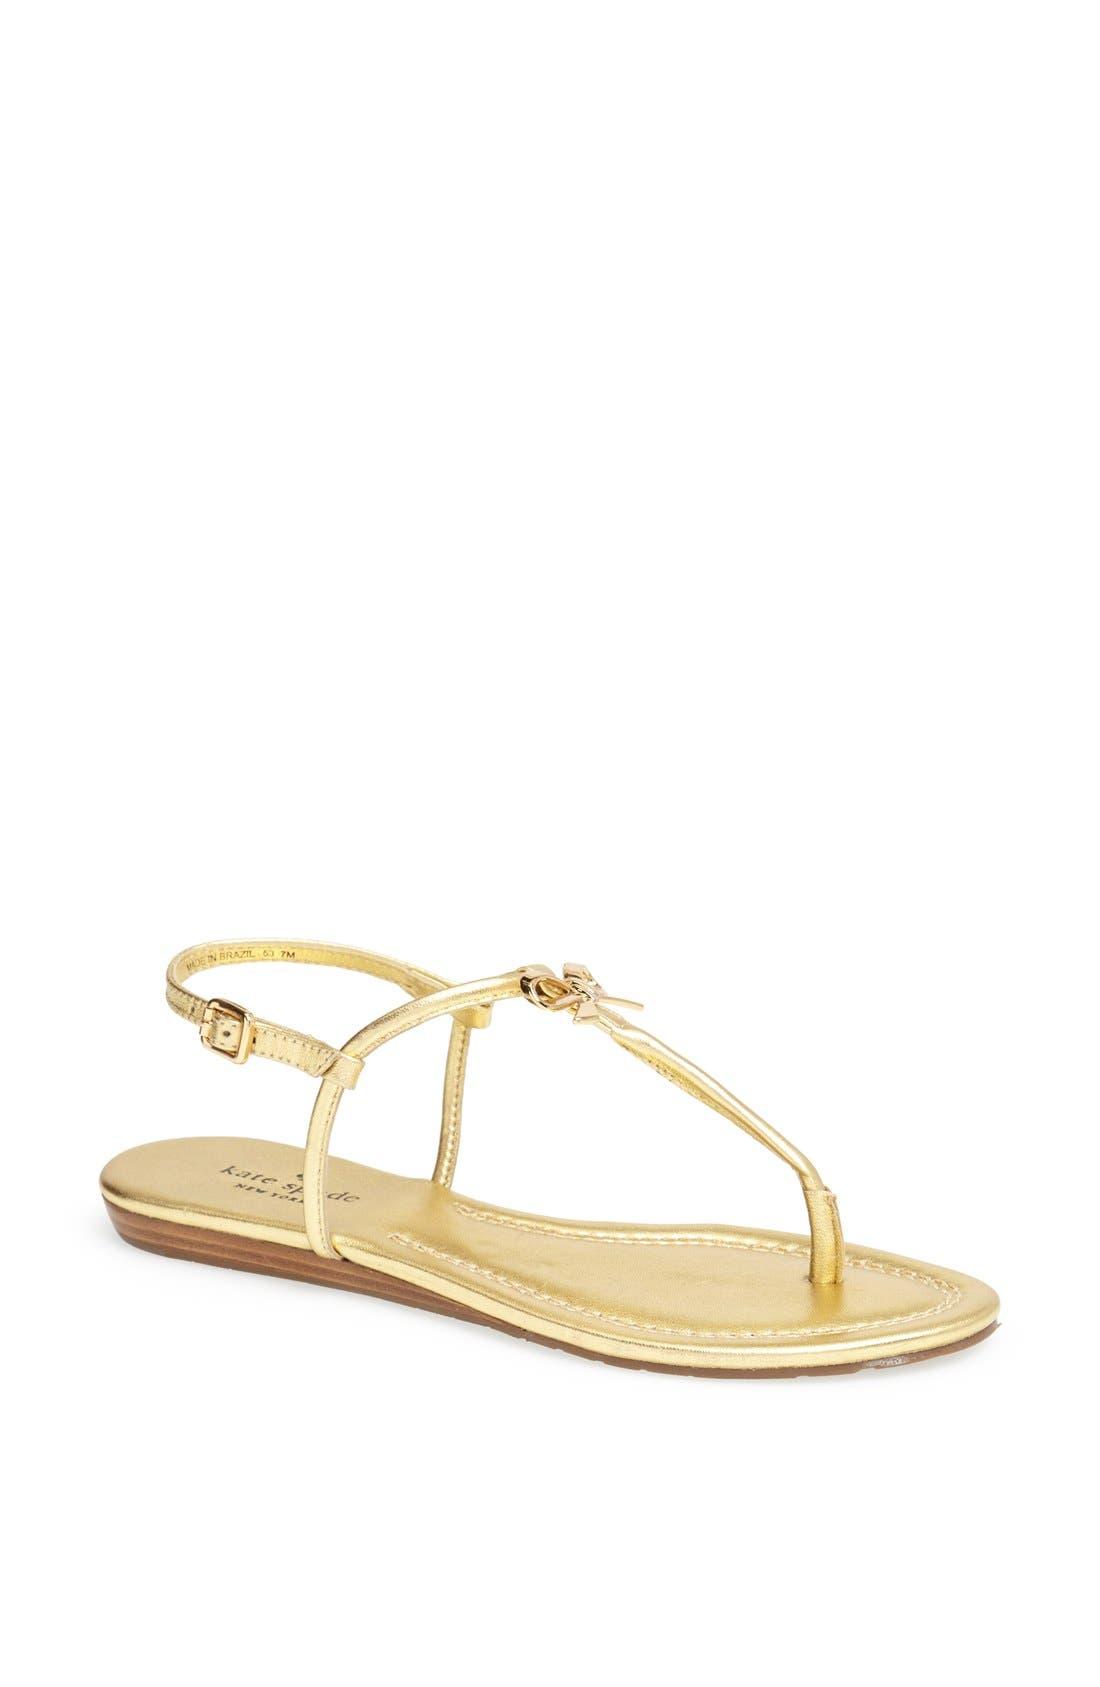 Main Image - kate spade new york 'tracie' sandal